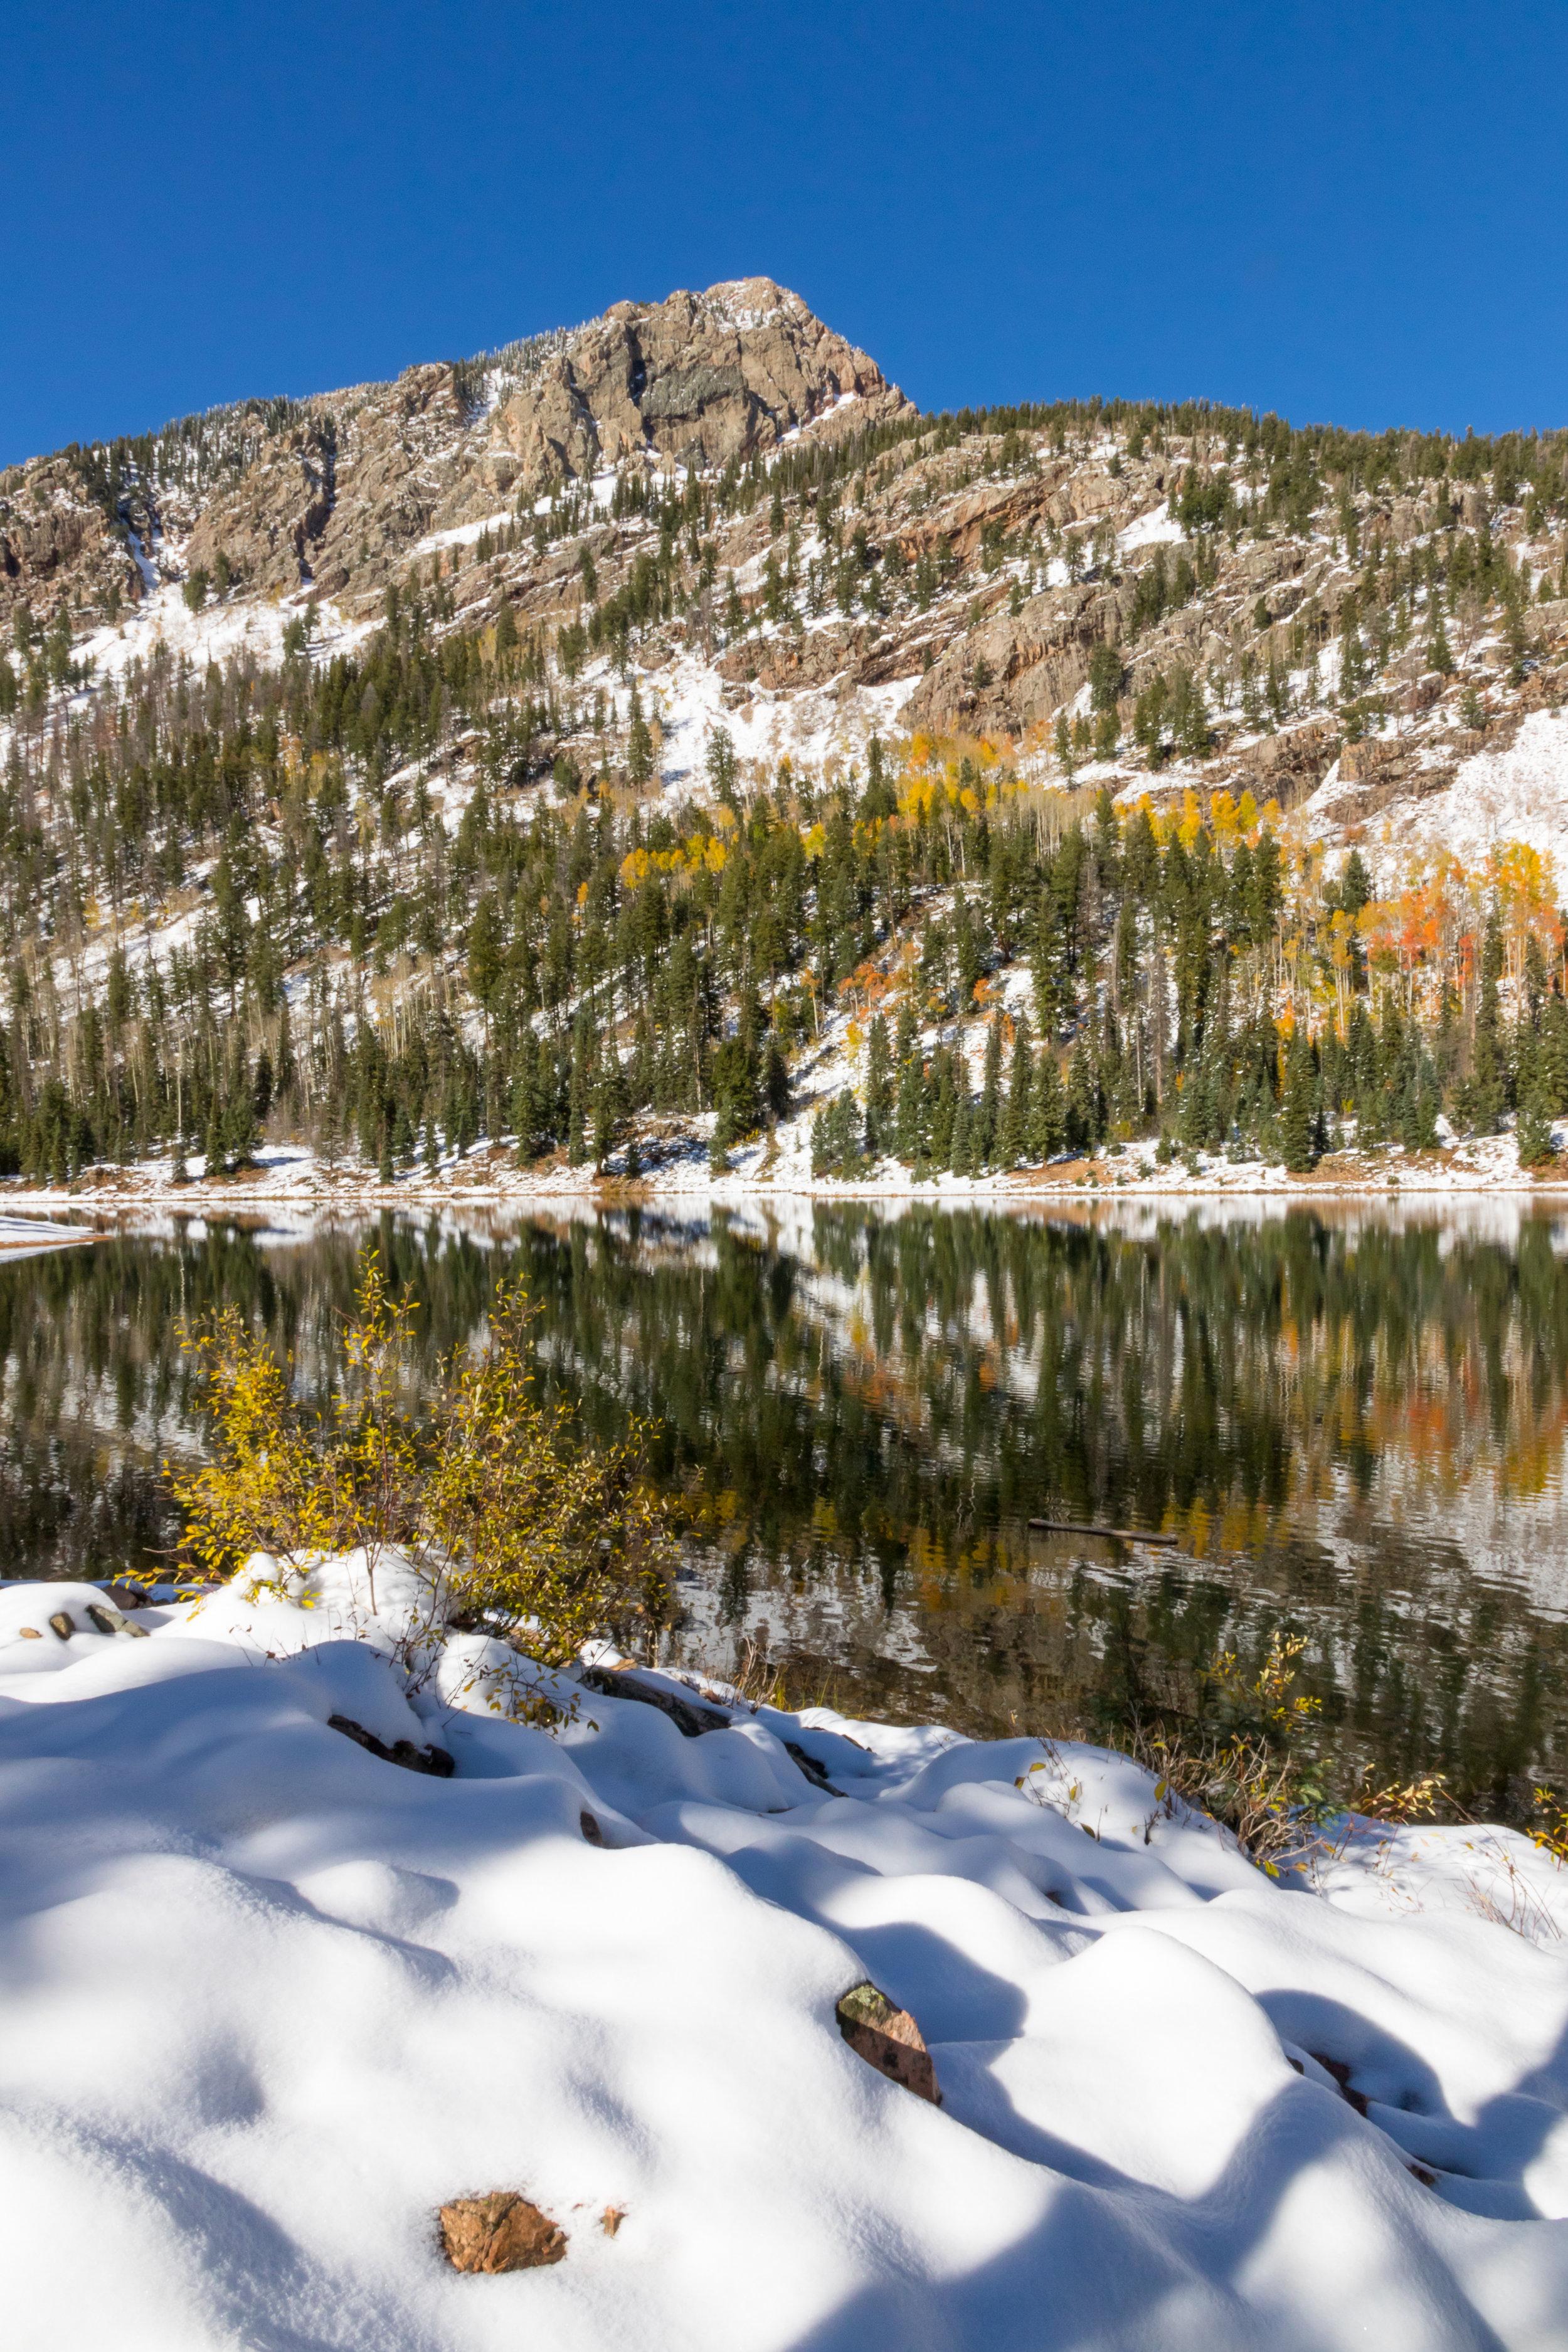 Spud Lake, Image # 1184